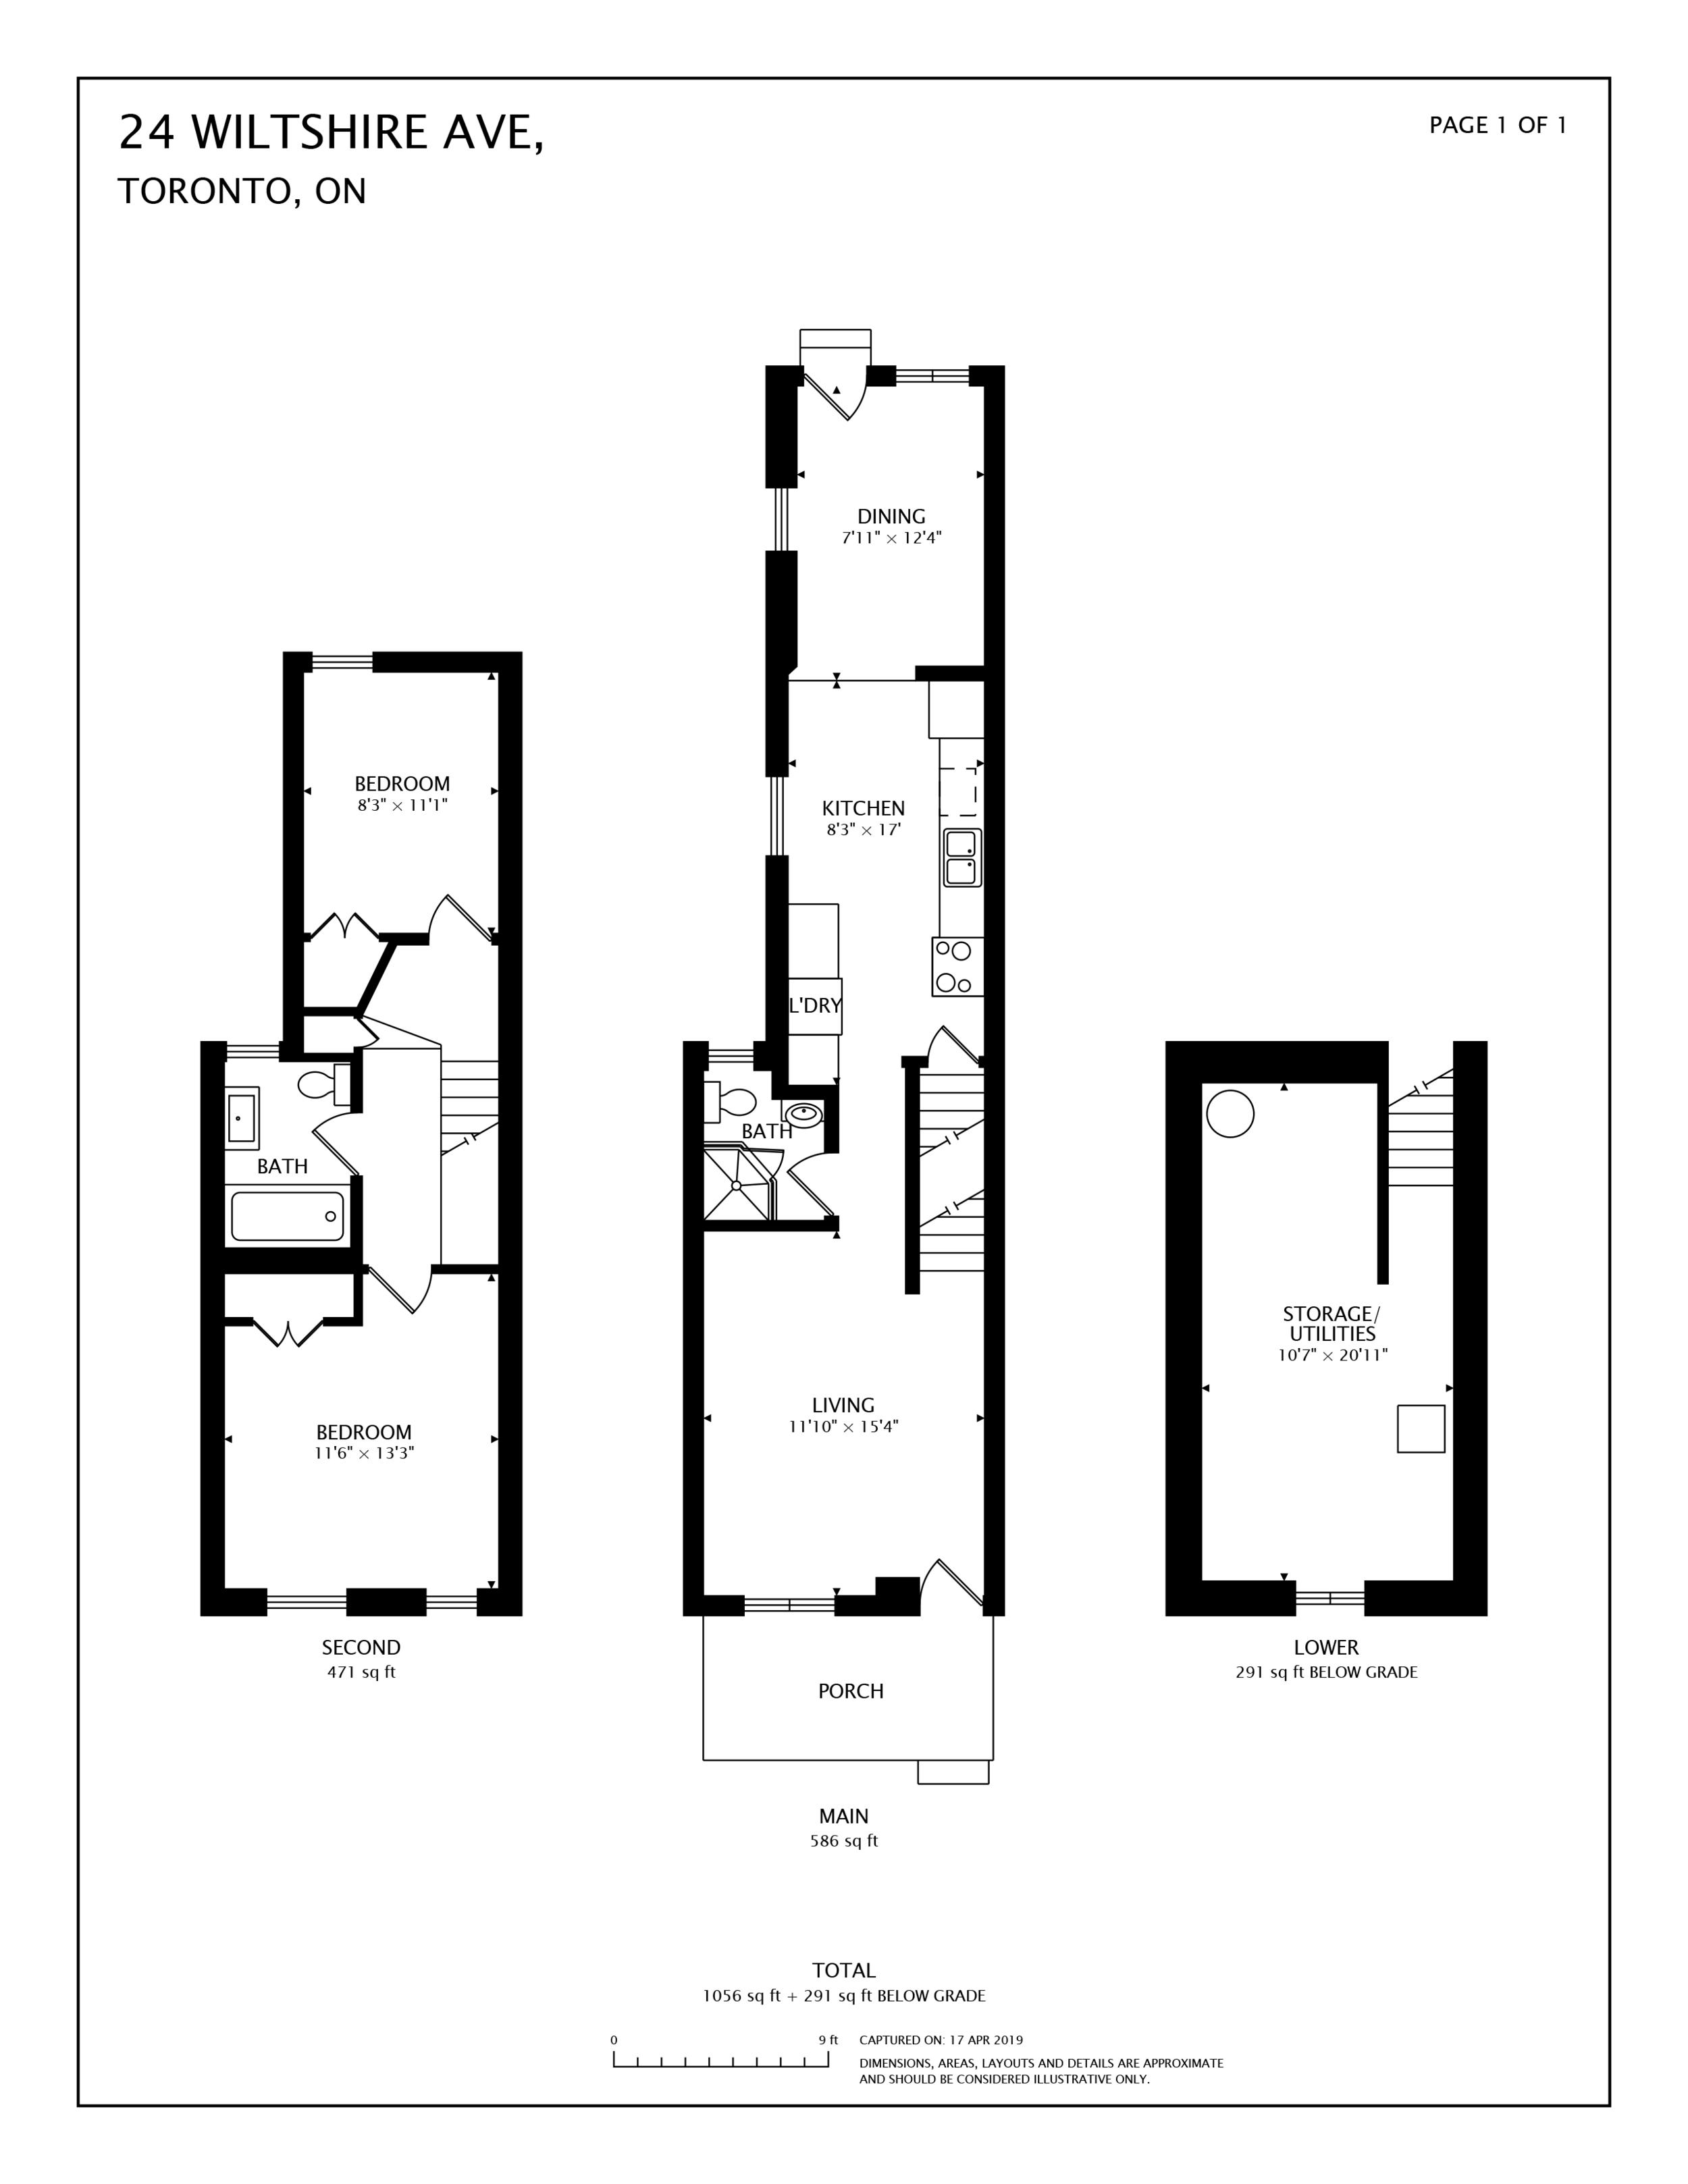 24-Wiltshire-Ave-Floorplan.png